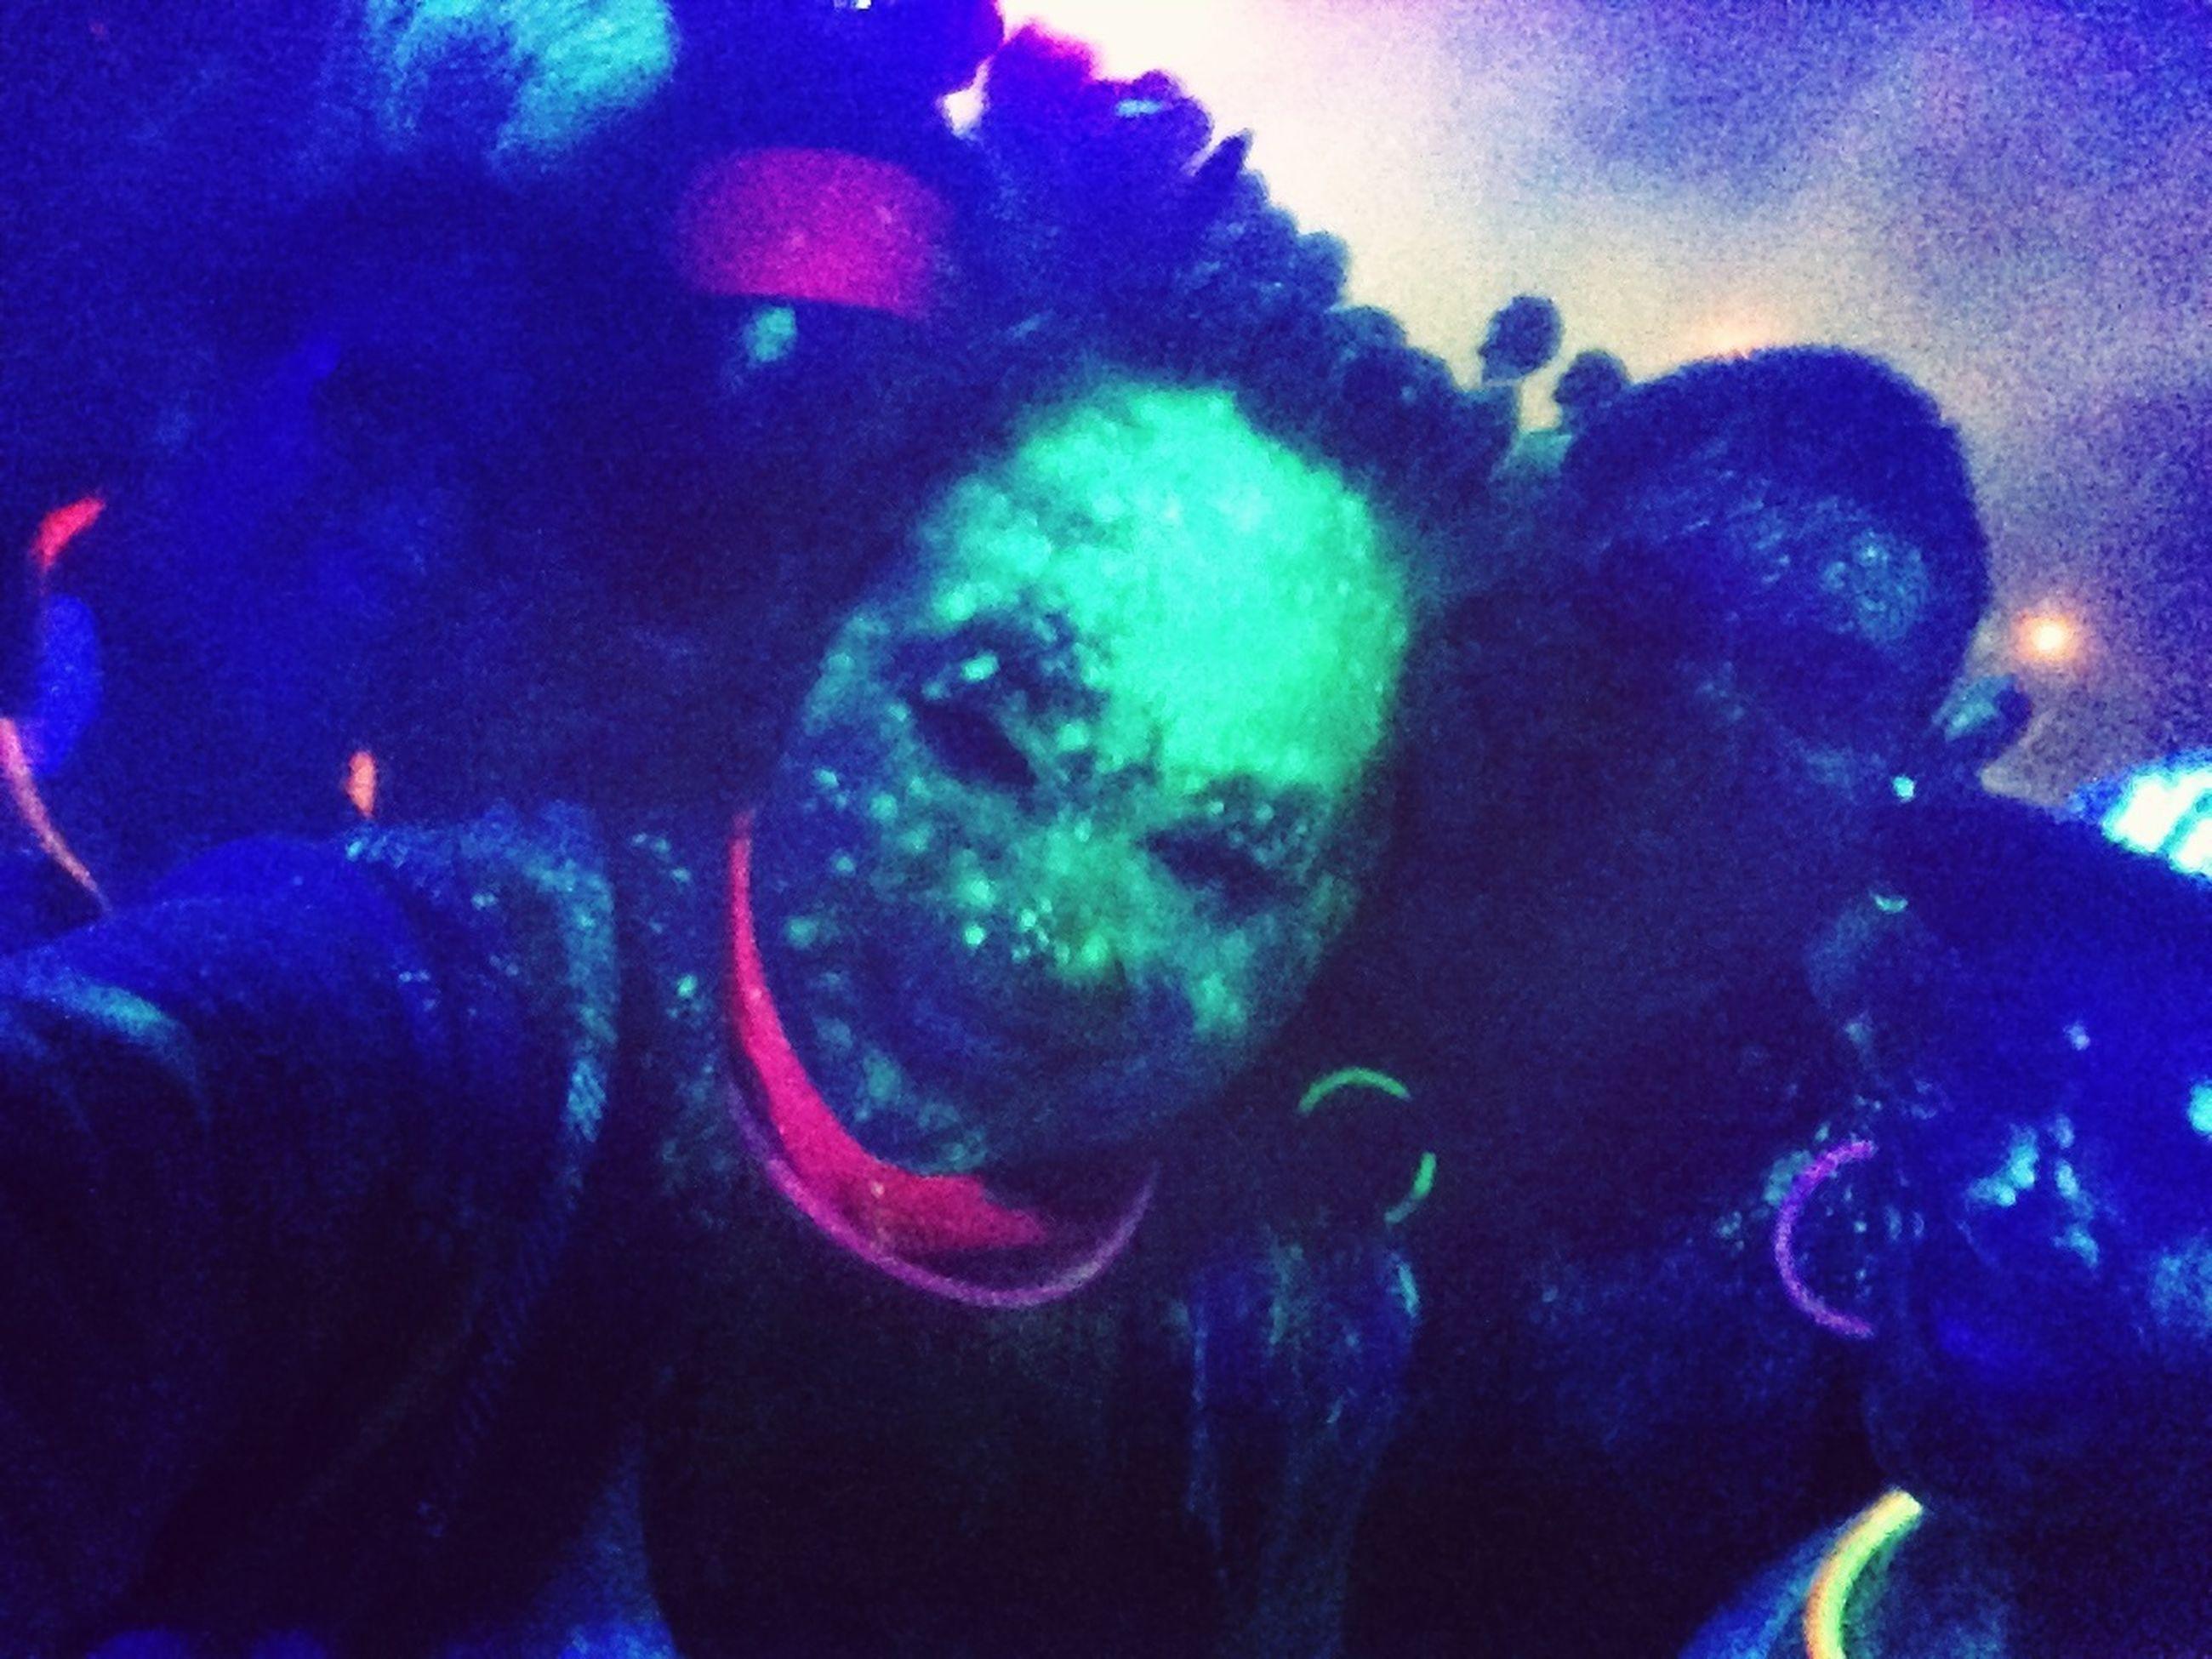 underwater, undersea, swimming, blue, sea life, water, aquarium, animal themes, sea, jellyfish, animals in the wild, fish, indoors, illuminated, wildlife, arts culture and entertainment, glowing, close-up, transparent